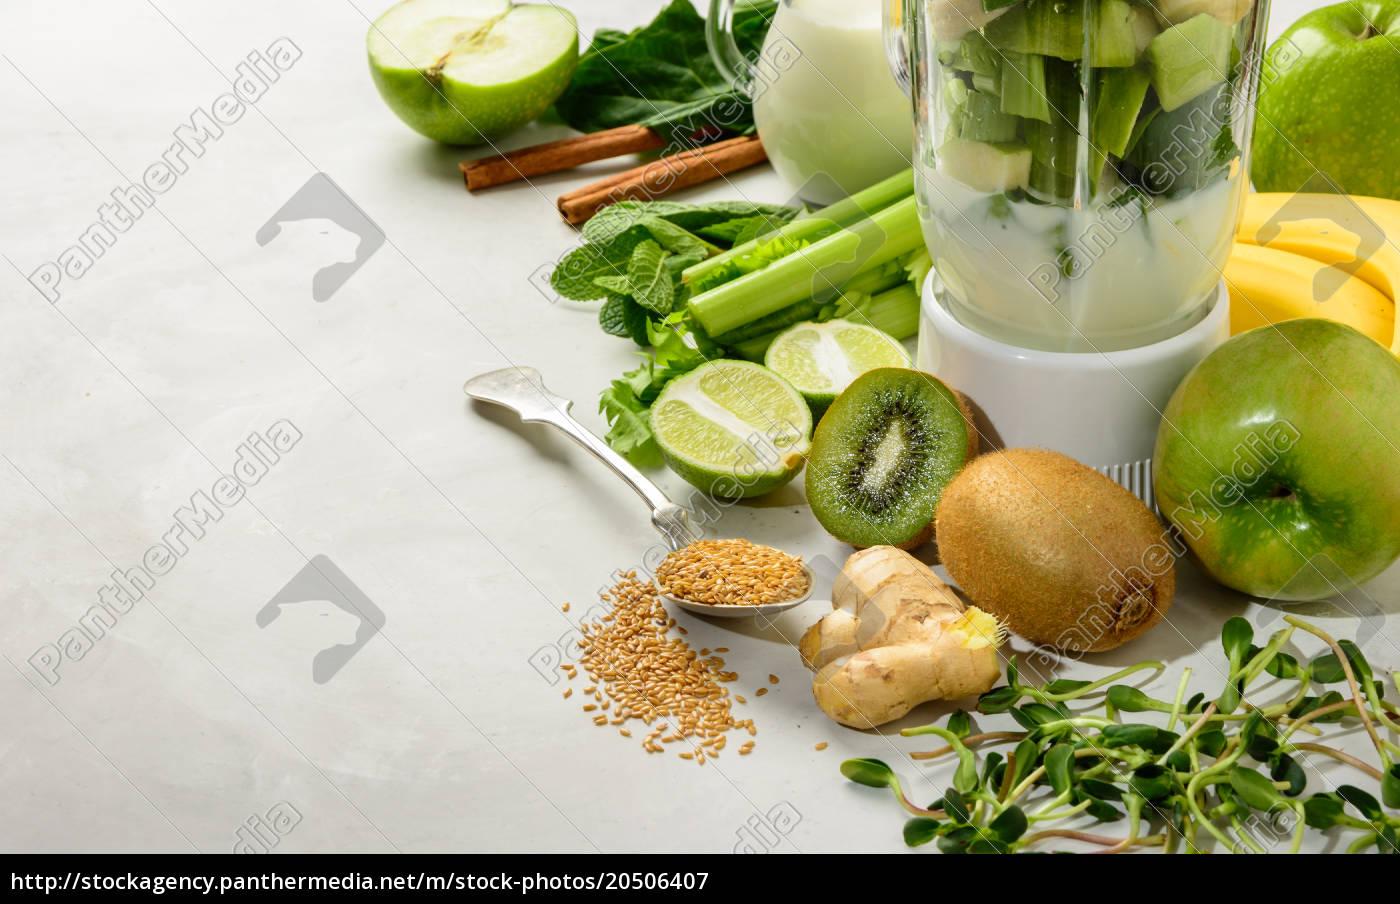 prepared, ingredients, for, smoothies - 20506407